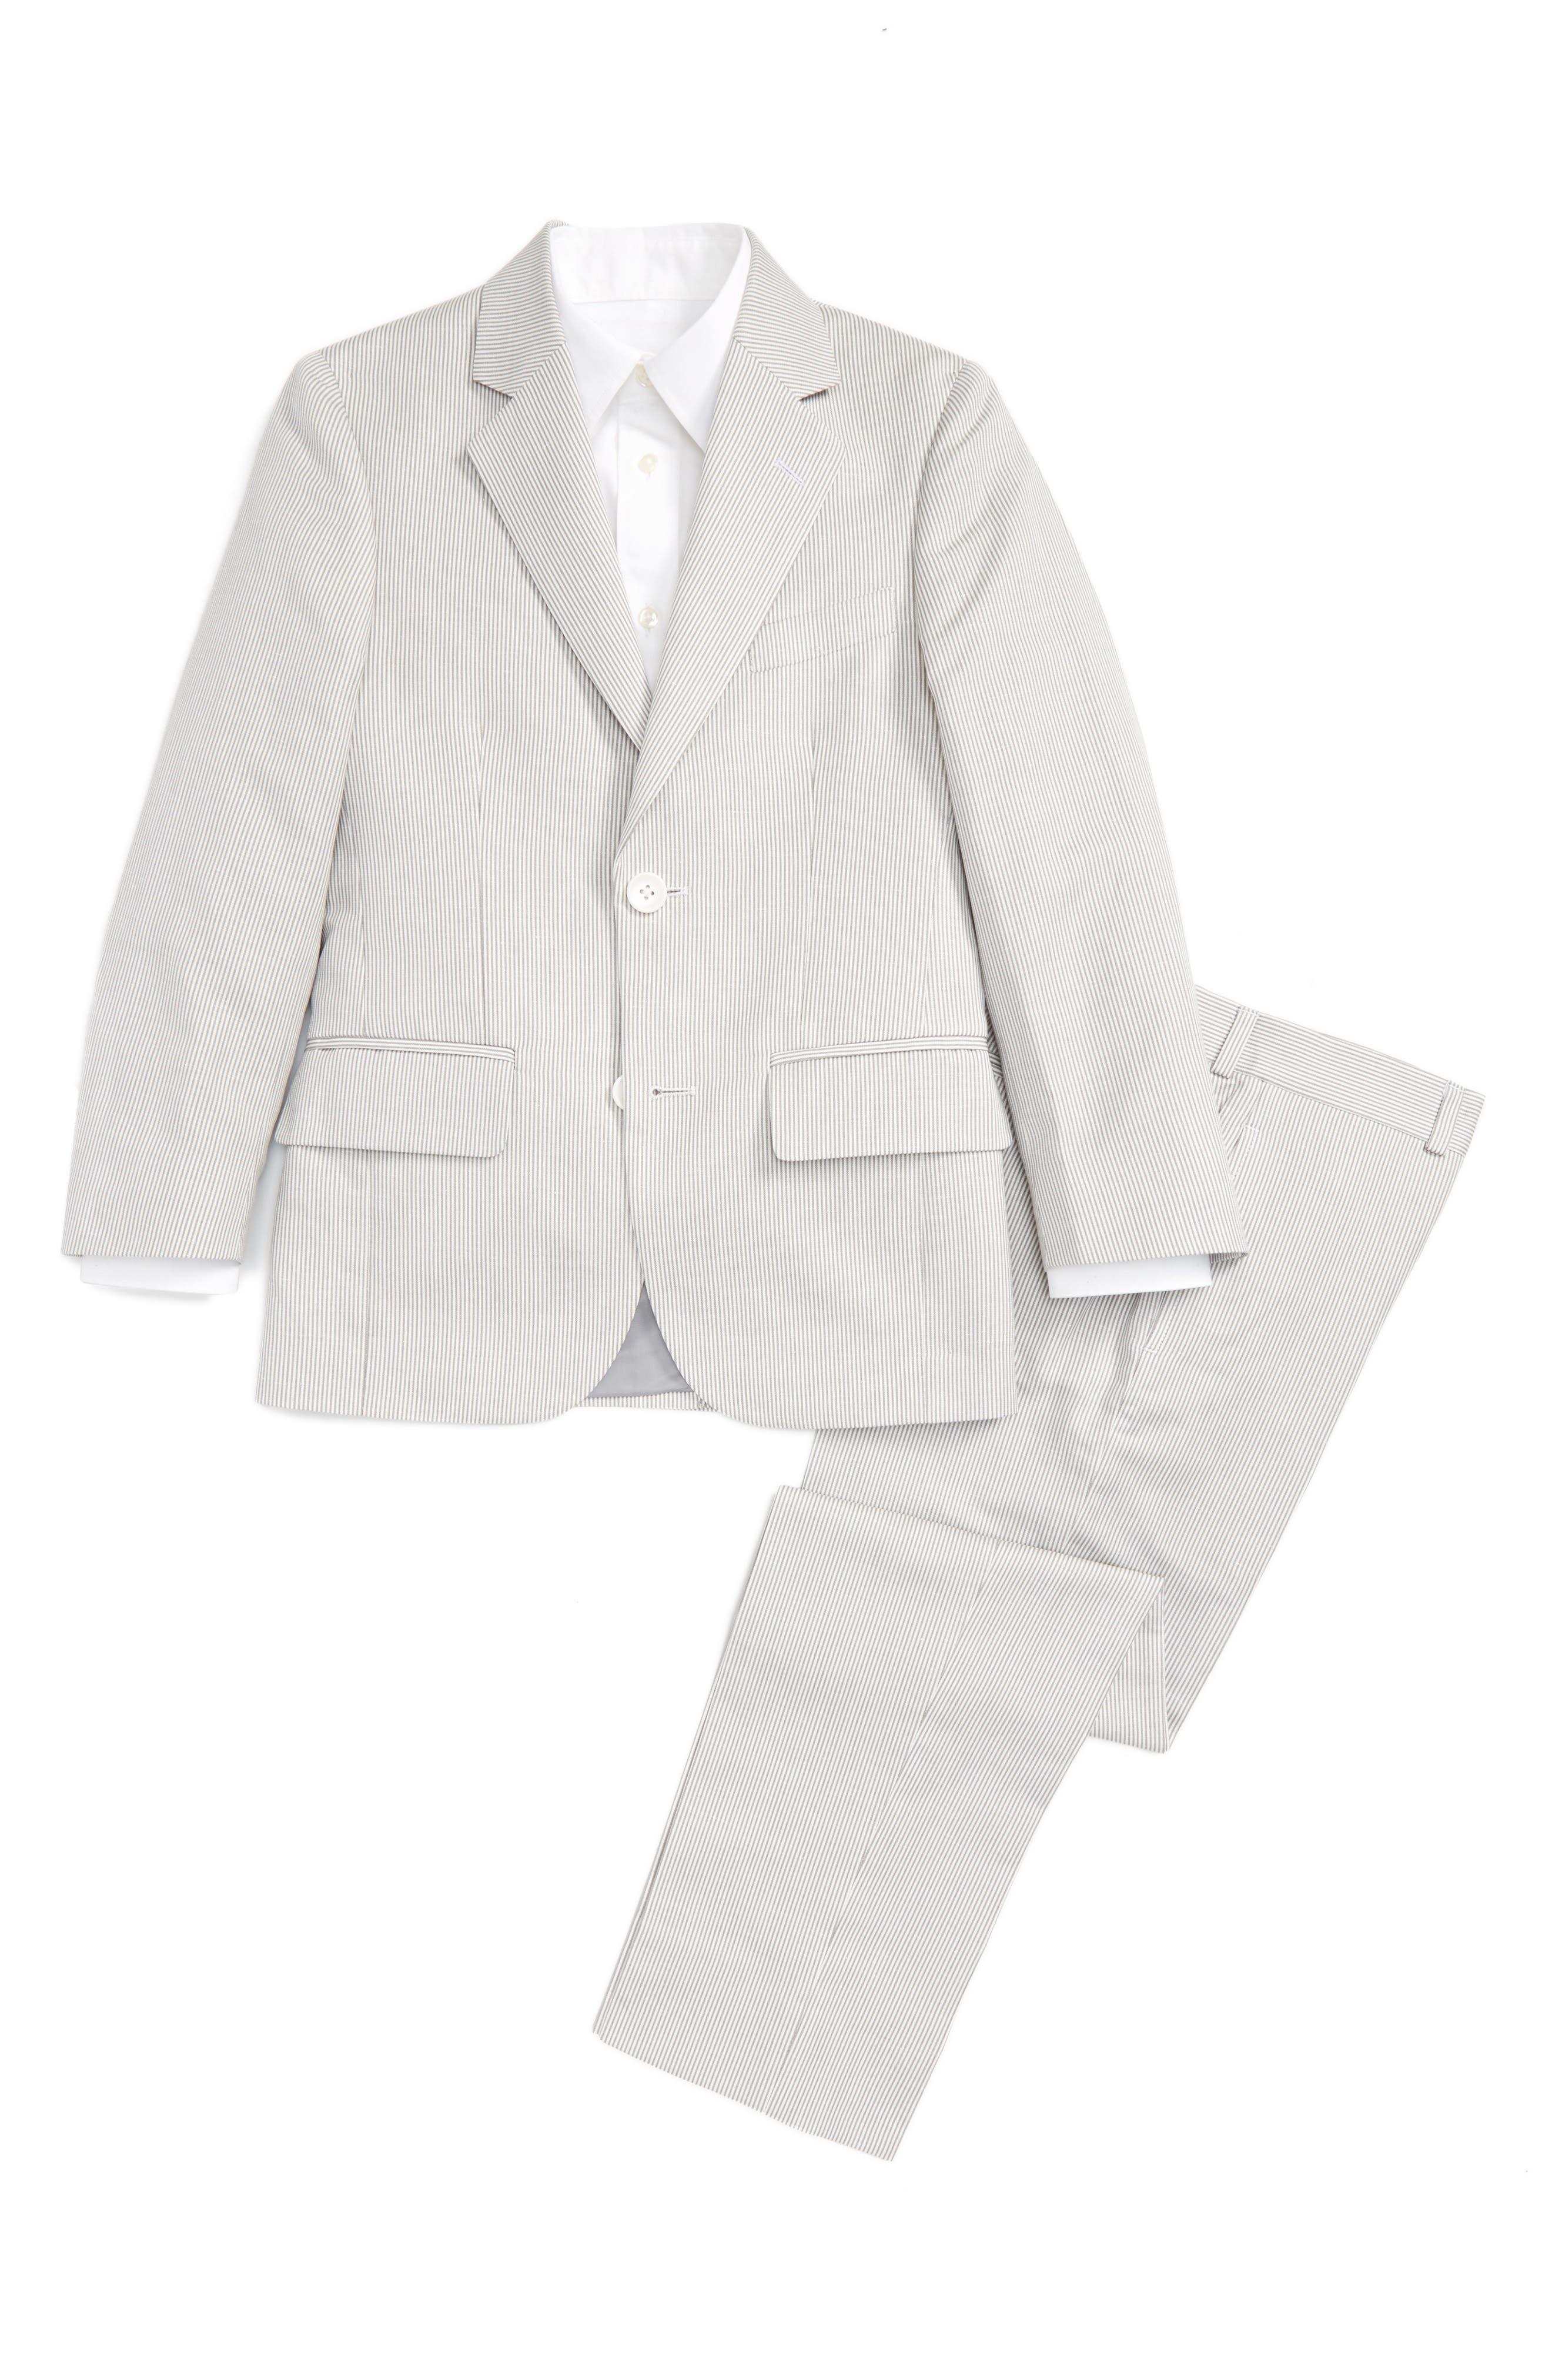 Alternate Image 1 Selected - JB Jr Stripe Cotton & Linen Sport Coat (Big Boys)